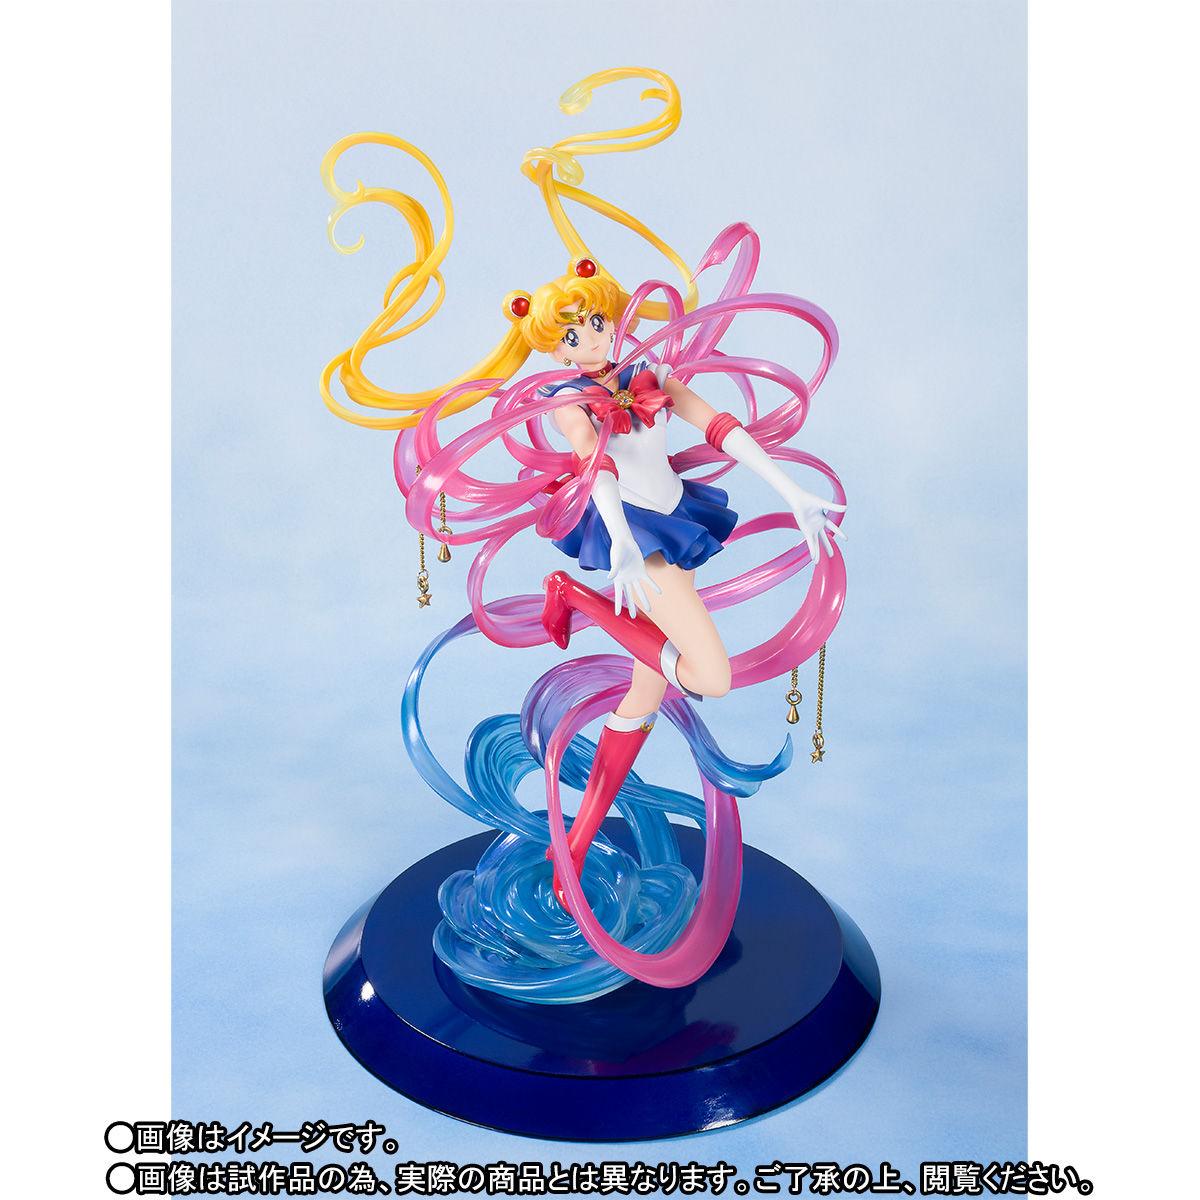 Figuarts Zero chouette『セーラームーン -Moon Crystal Power, Make Up-』完成品フィギュア-004